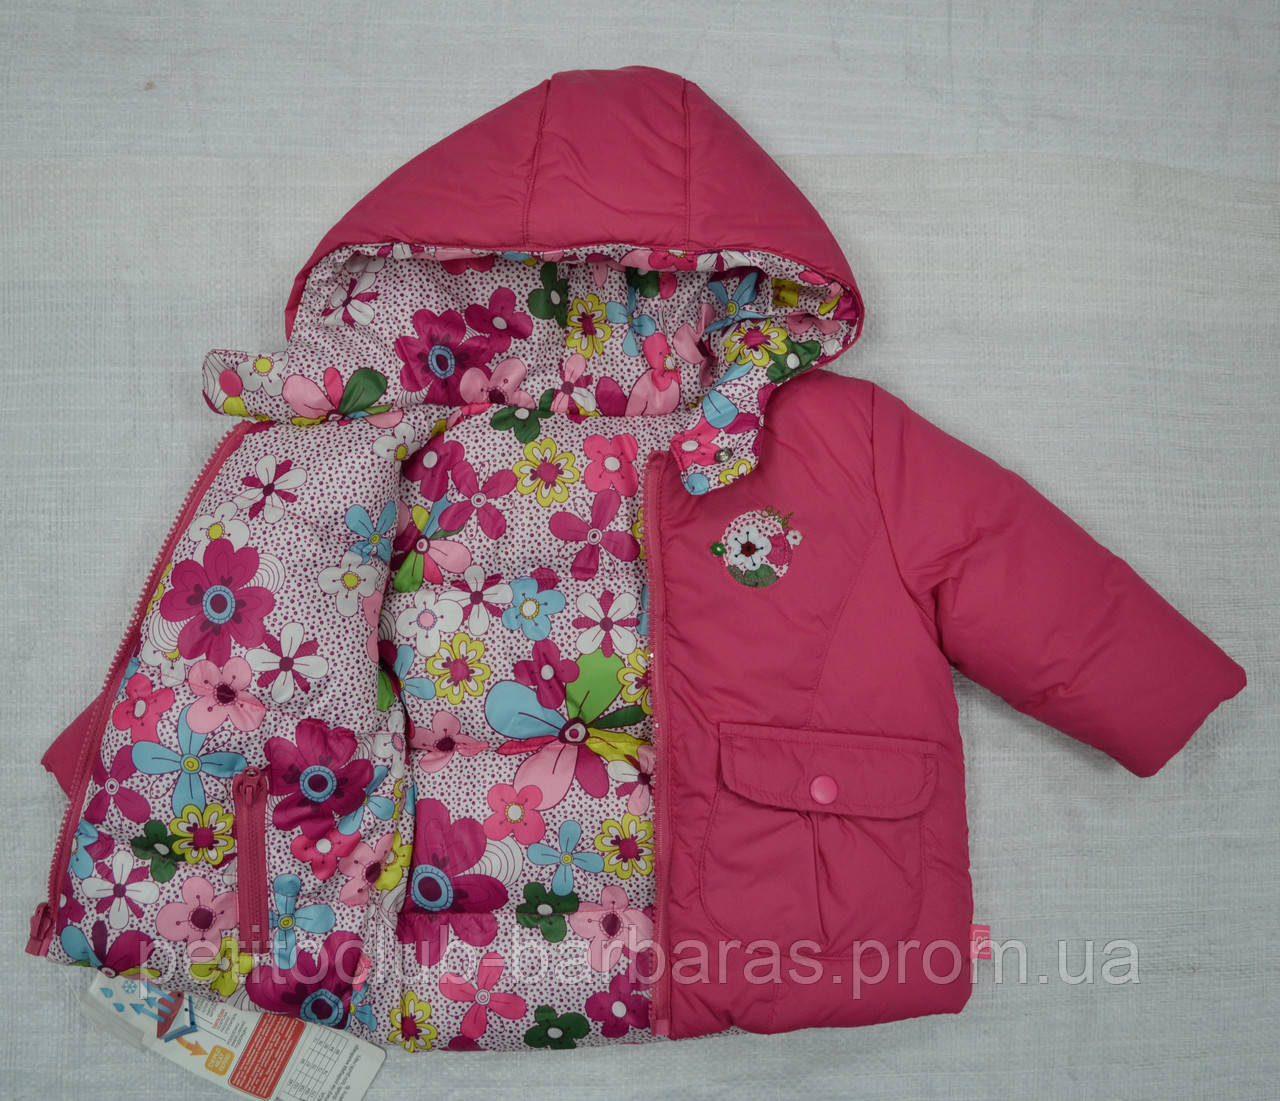 Куртка зимняя для девочки 2-сторонняя розовая (р.80-98 см) (QuadriFoglio, Польша)